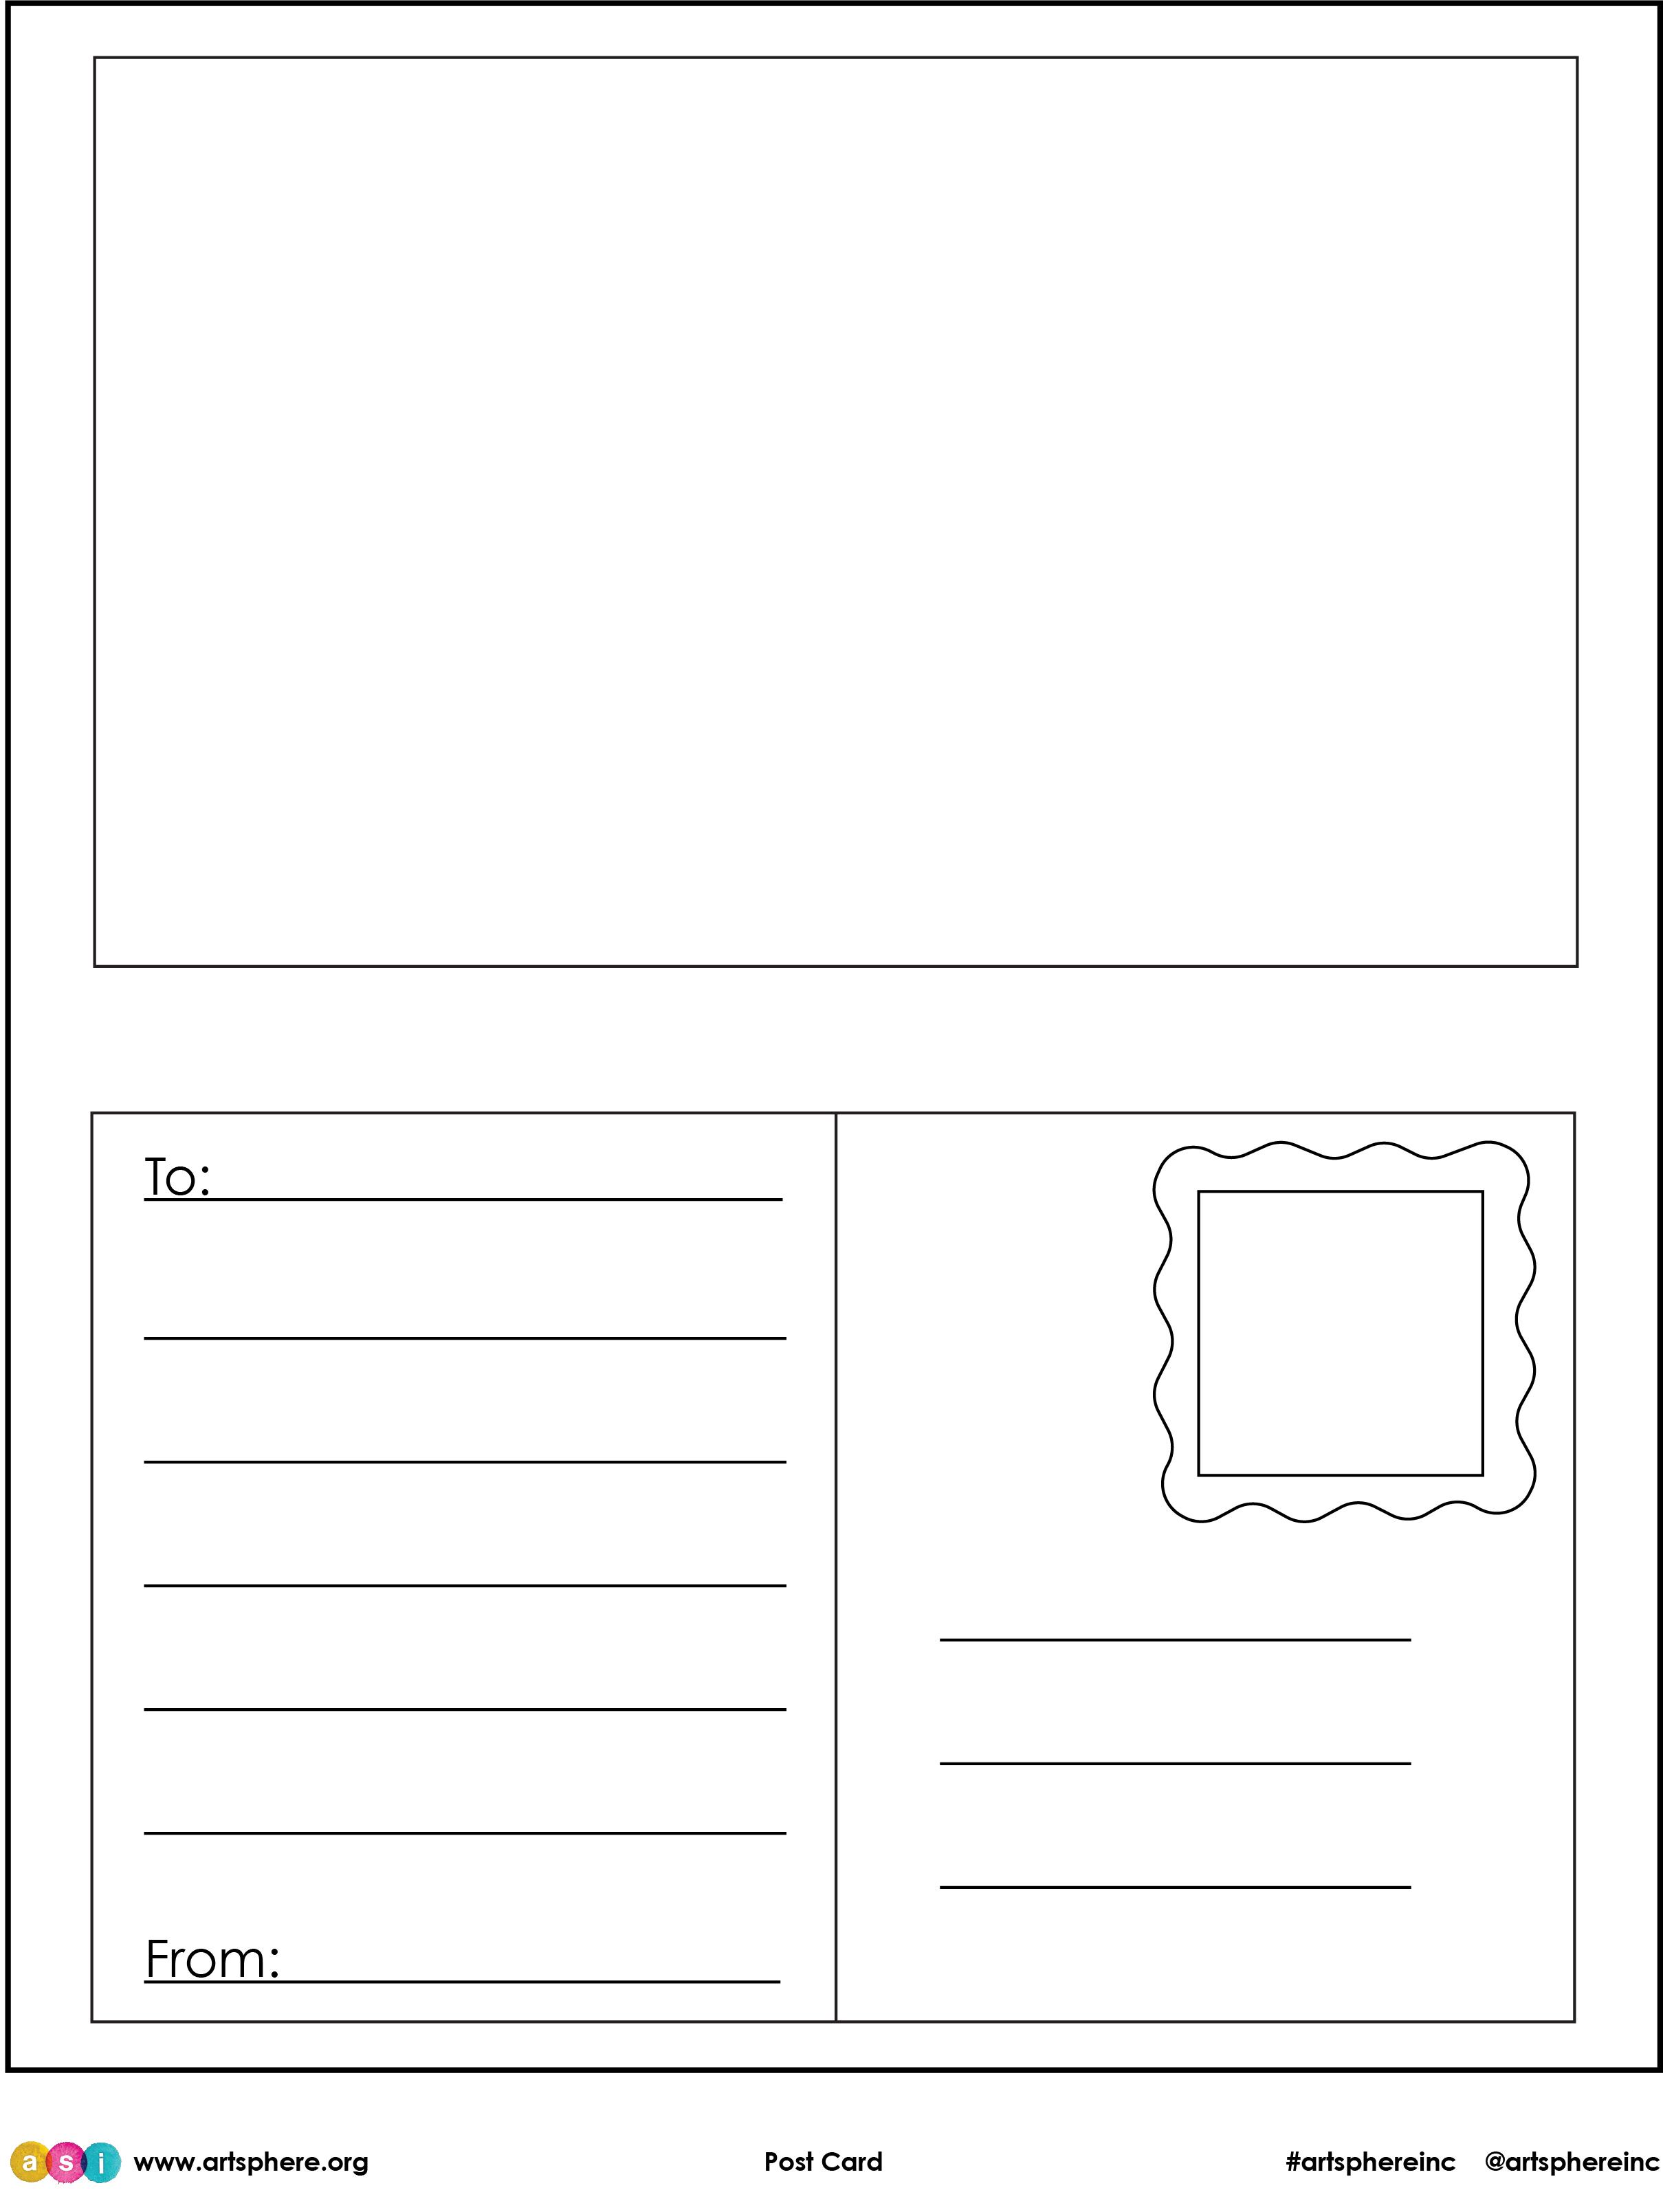 Free Lesson Plan: Post Card